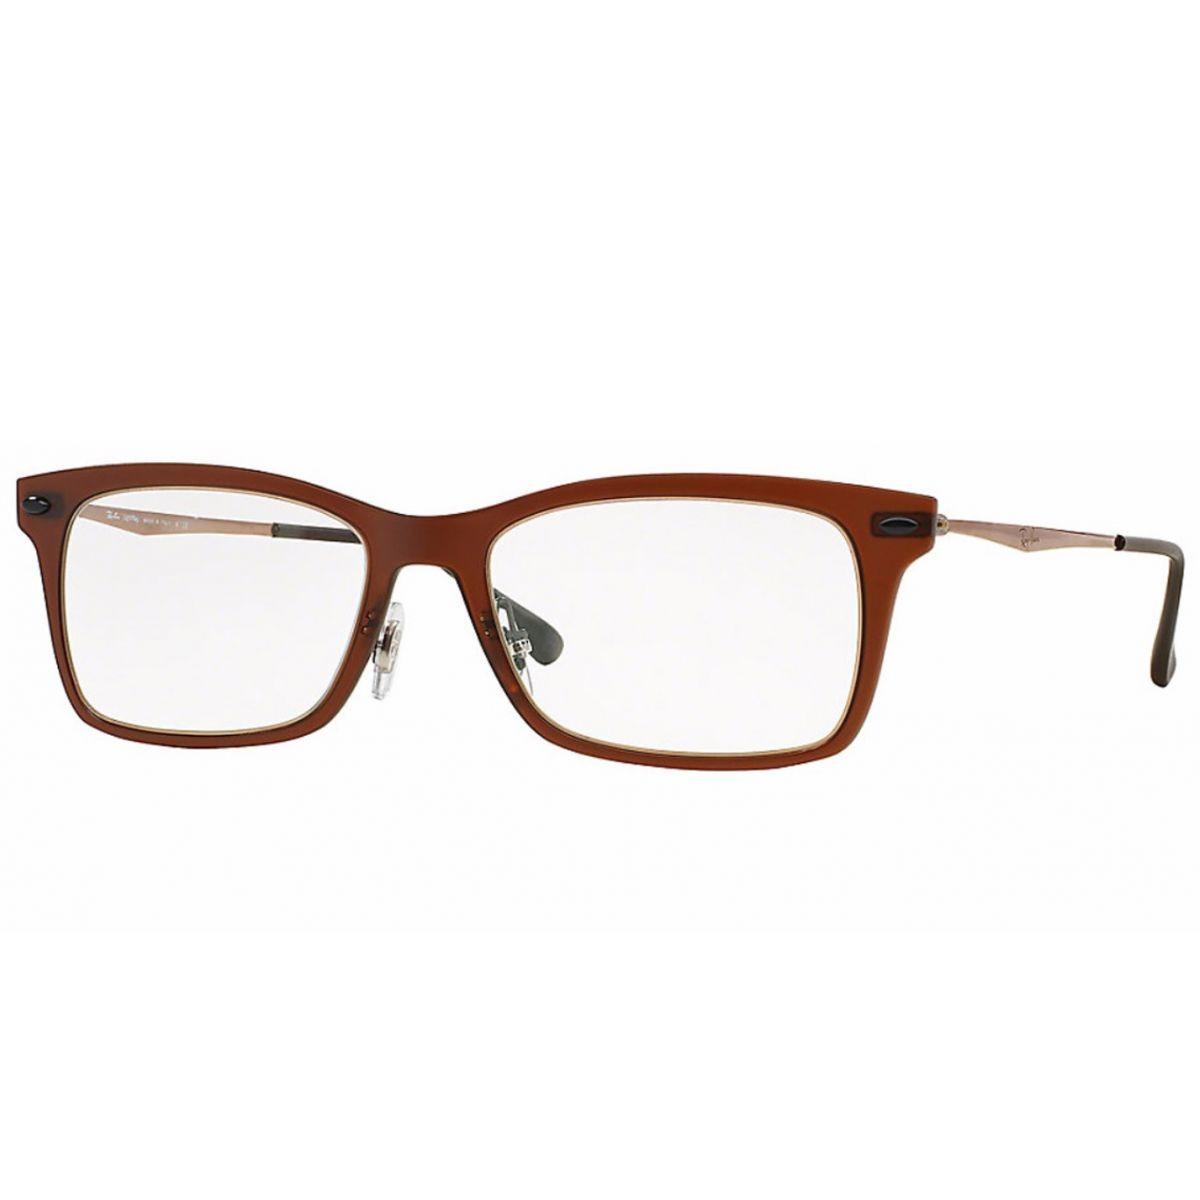 Tag  Fotos De Oculos De Grau Feminino Ray Ban 37cc14a992